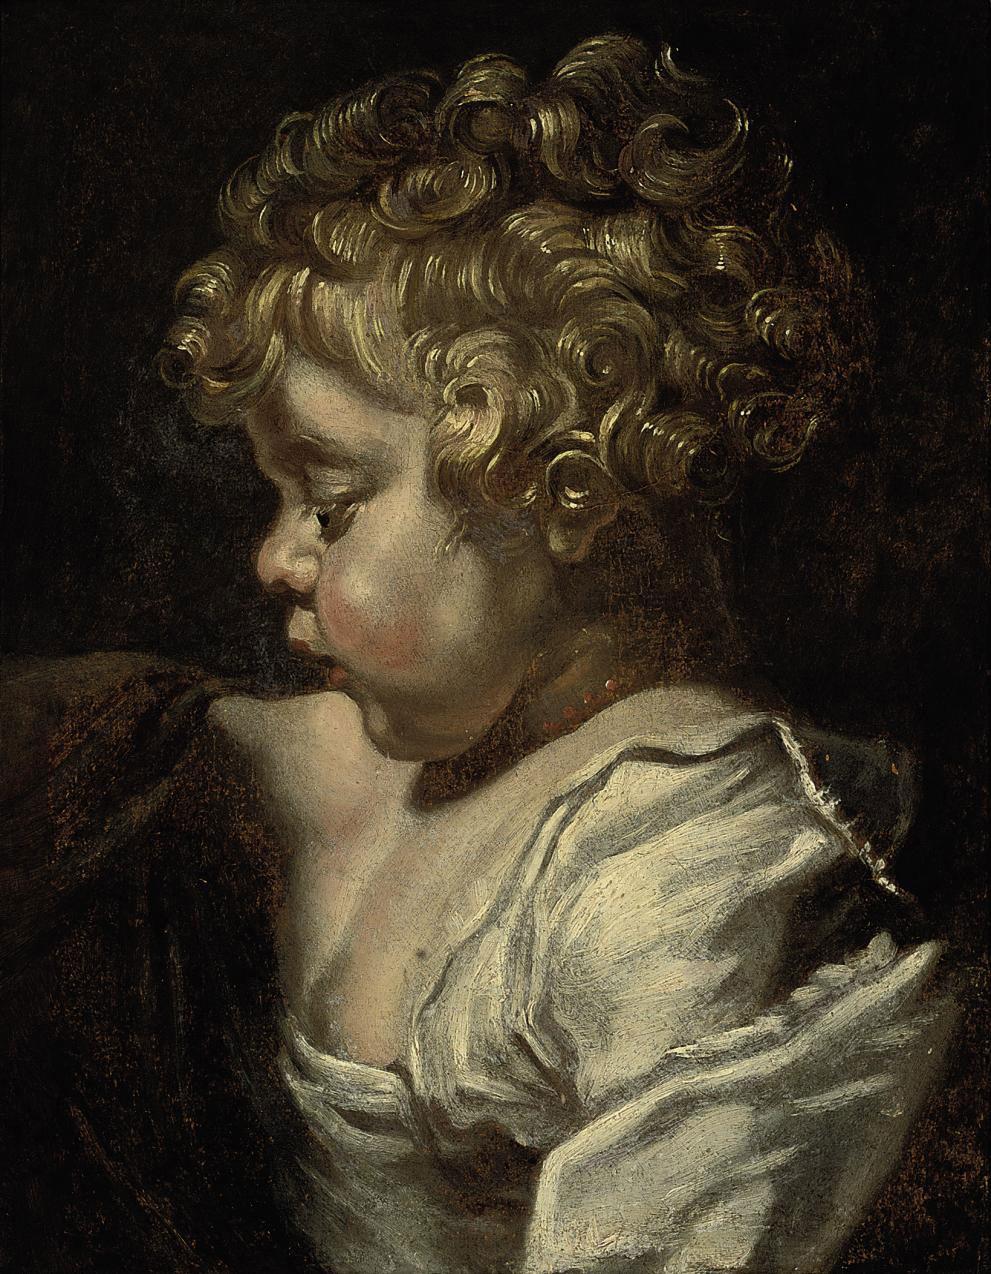 After Sir Antony van Dyck